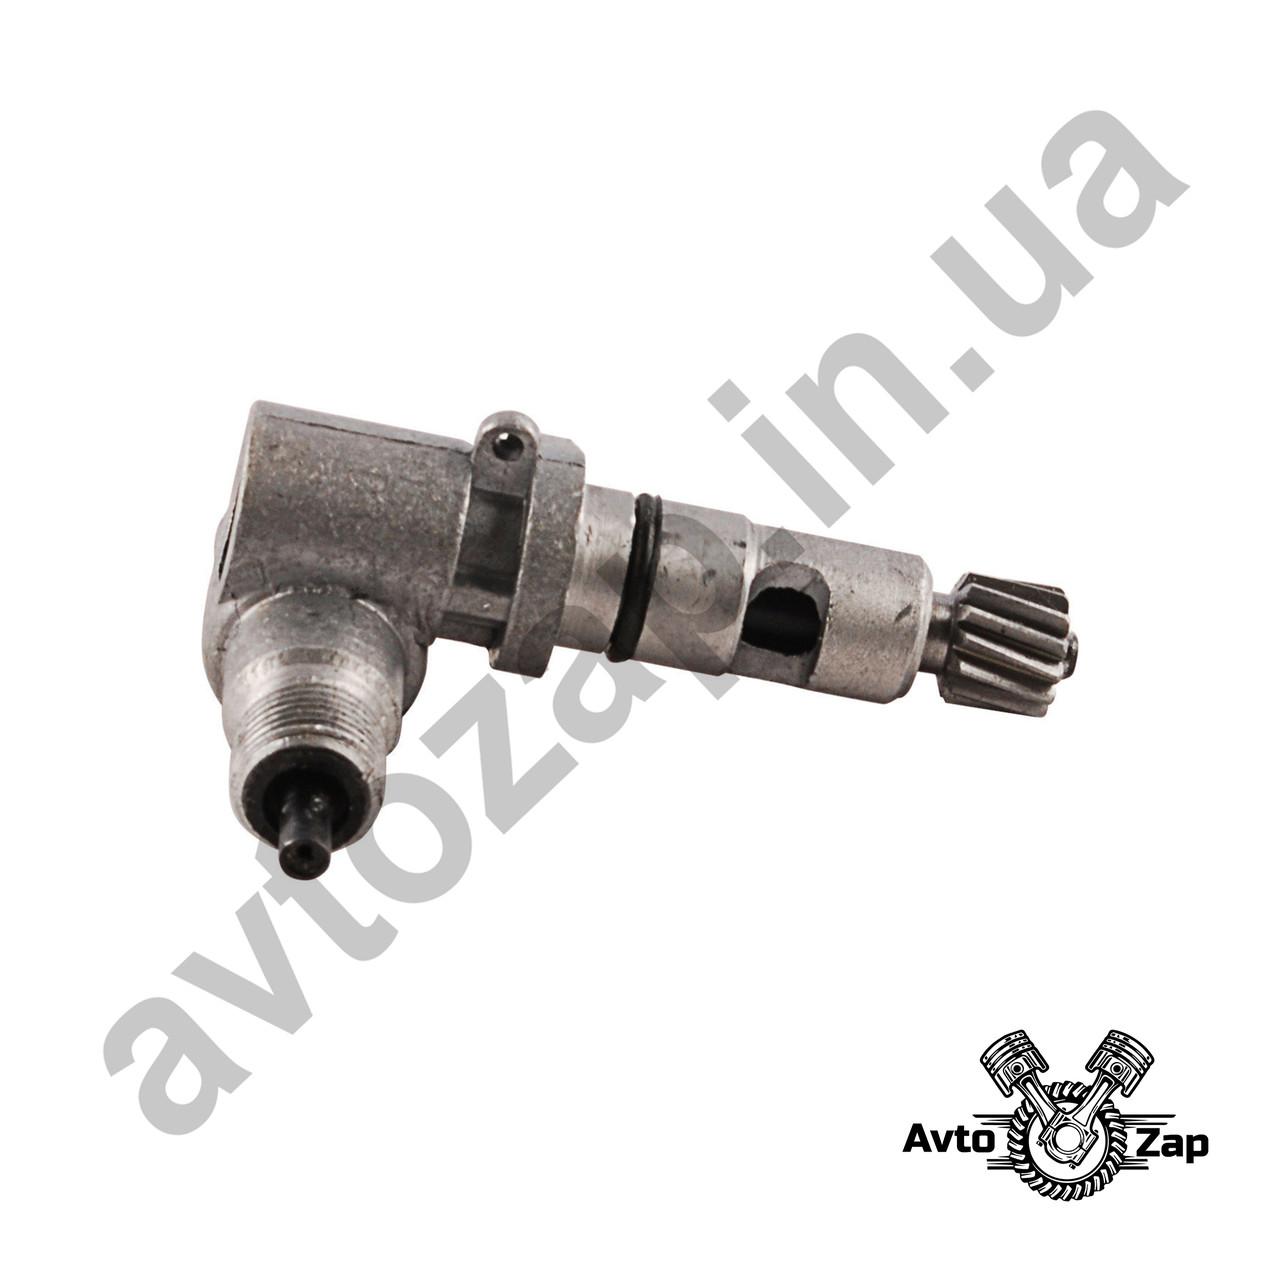 Привод спидометра ВАЗ 2106 (13 зубьев)     30835